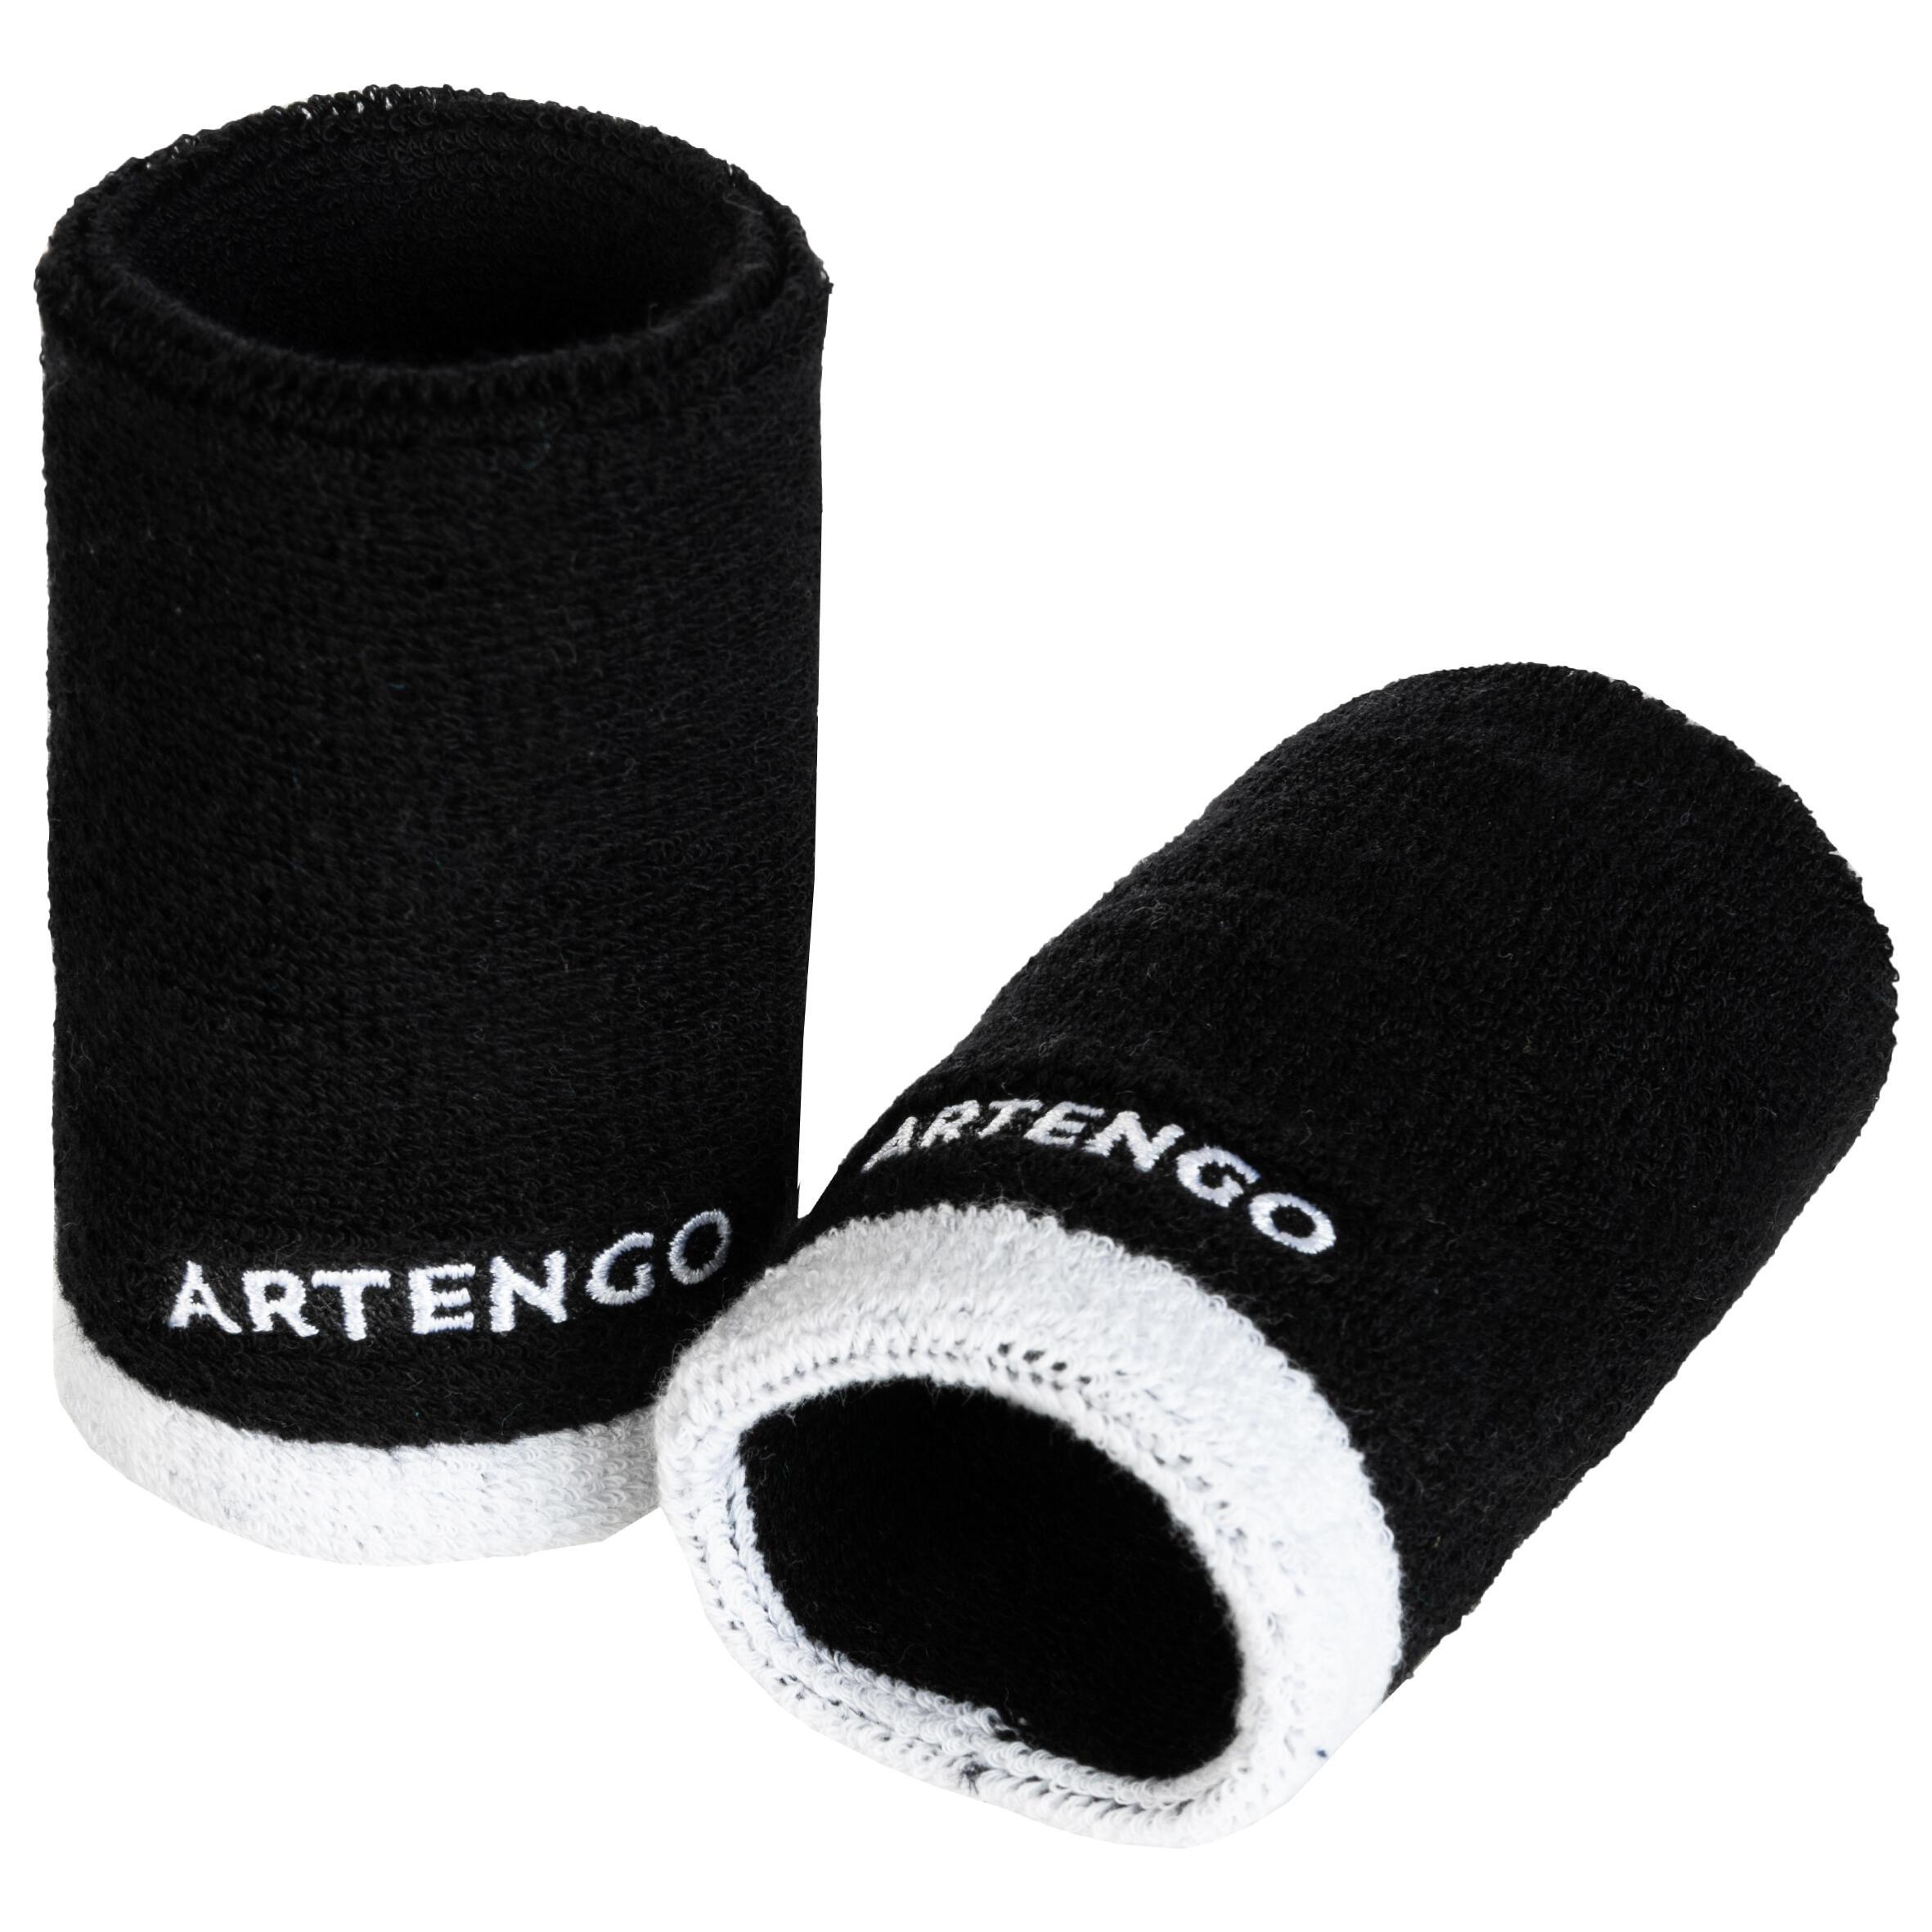 Long Wristband - Black/White